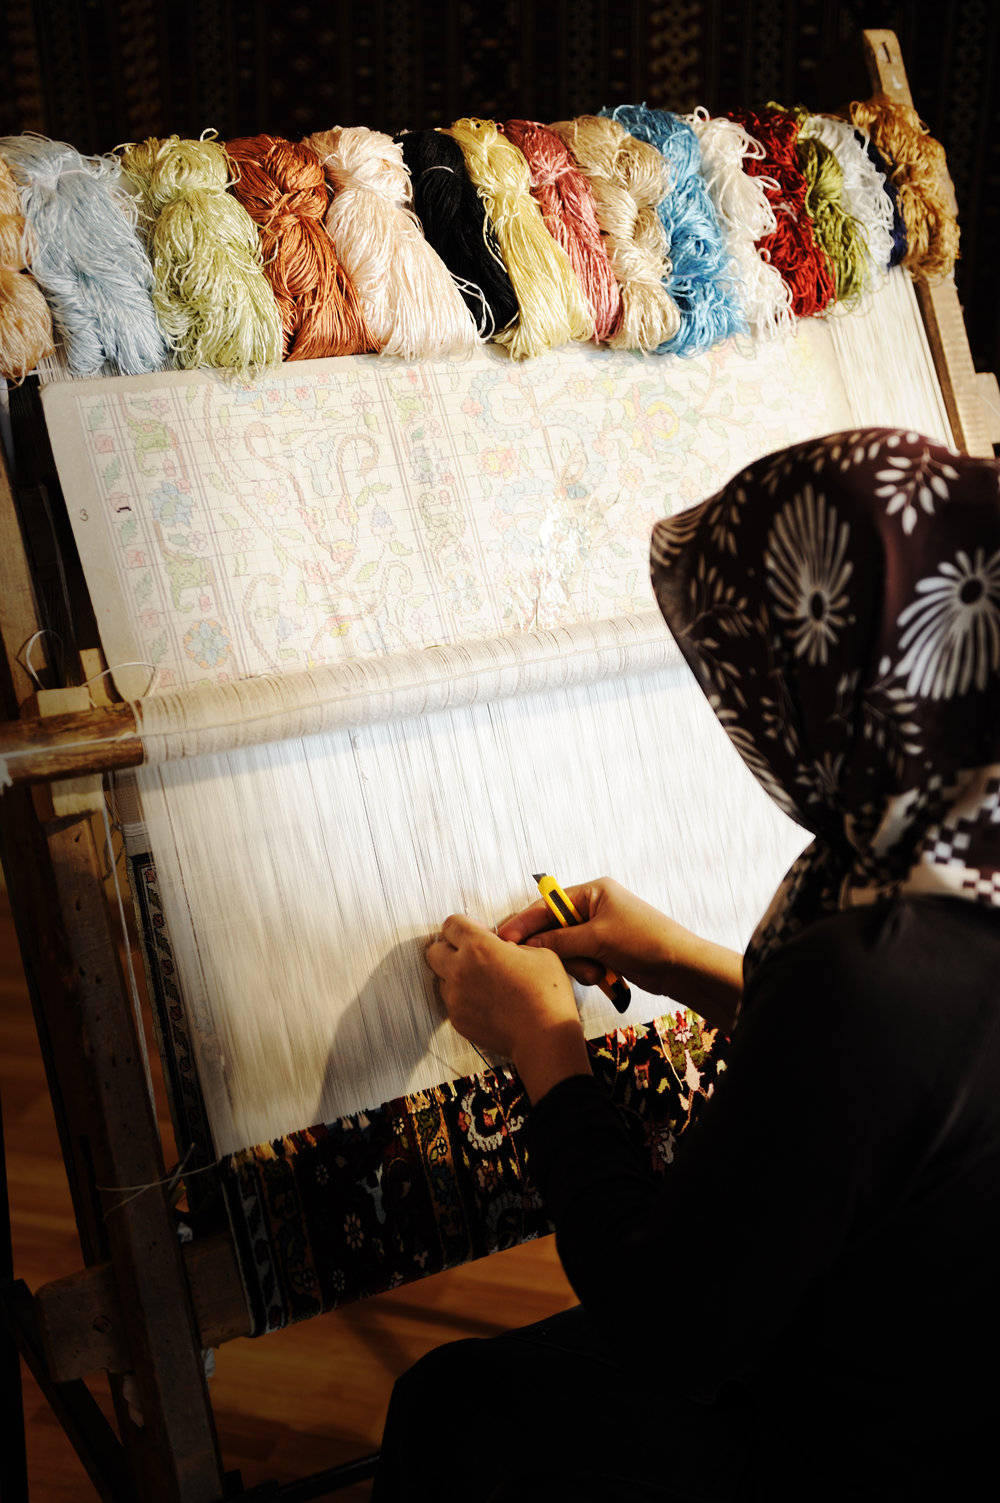 woman-working-at-the-loom-oriental-muslim-national-crafts-focus-on-the-fabric_HKGNdY0Vj.jpg